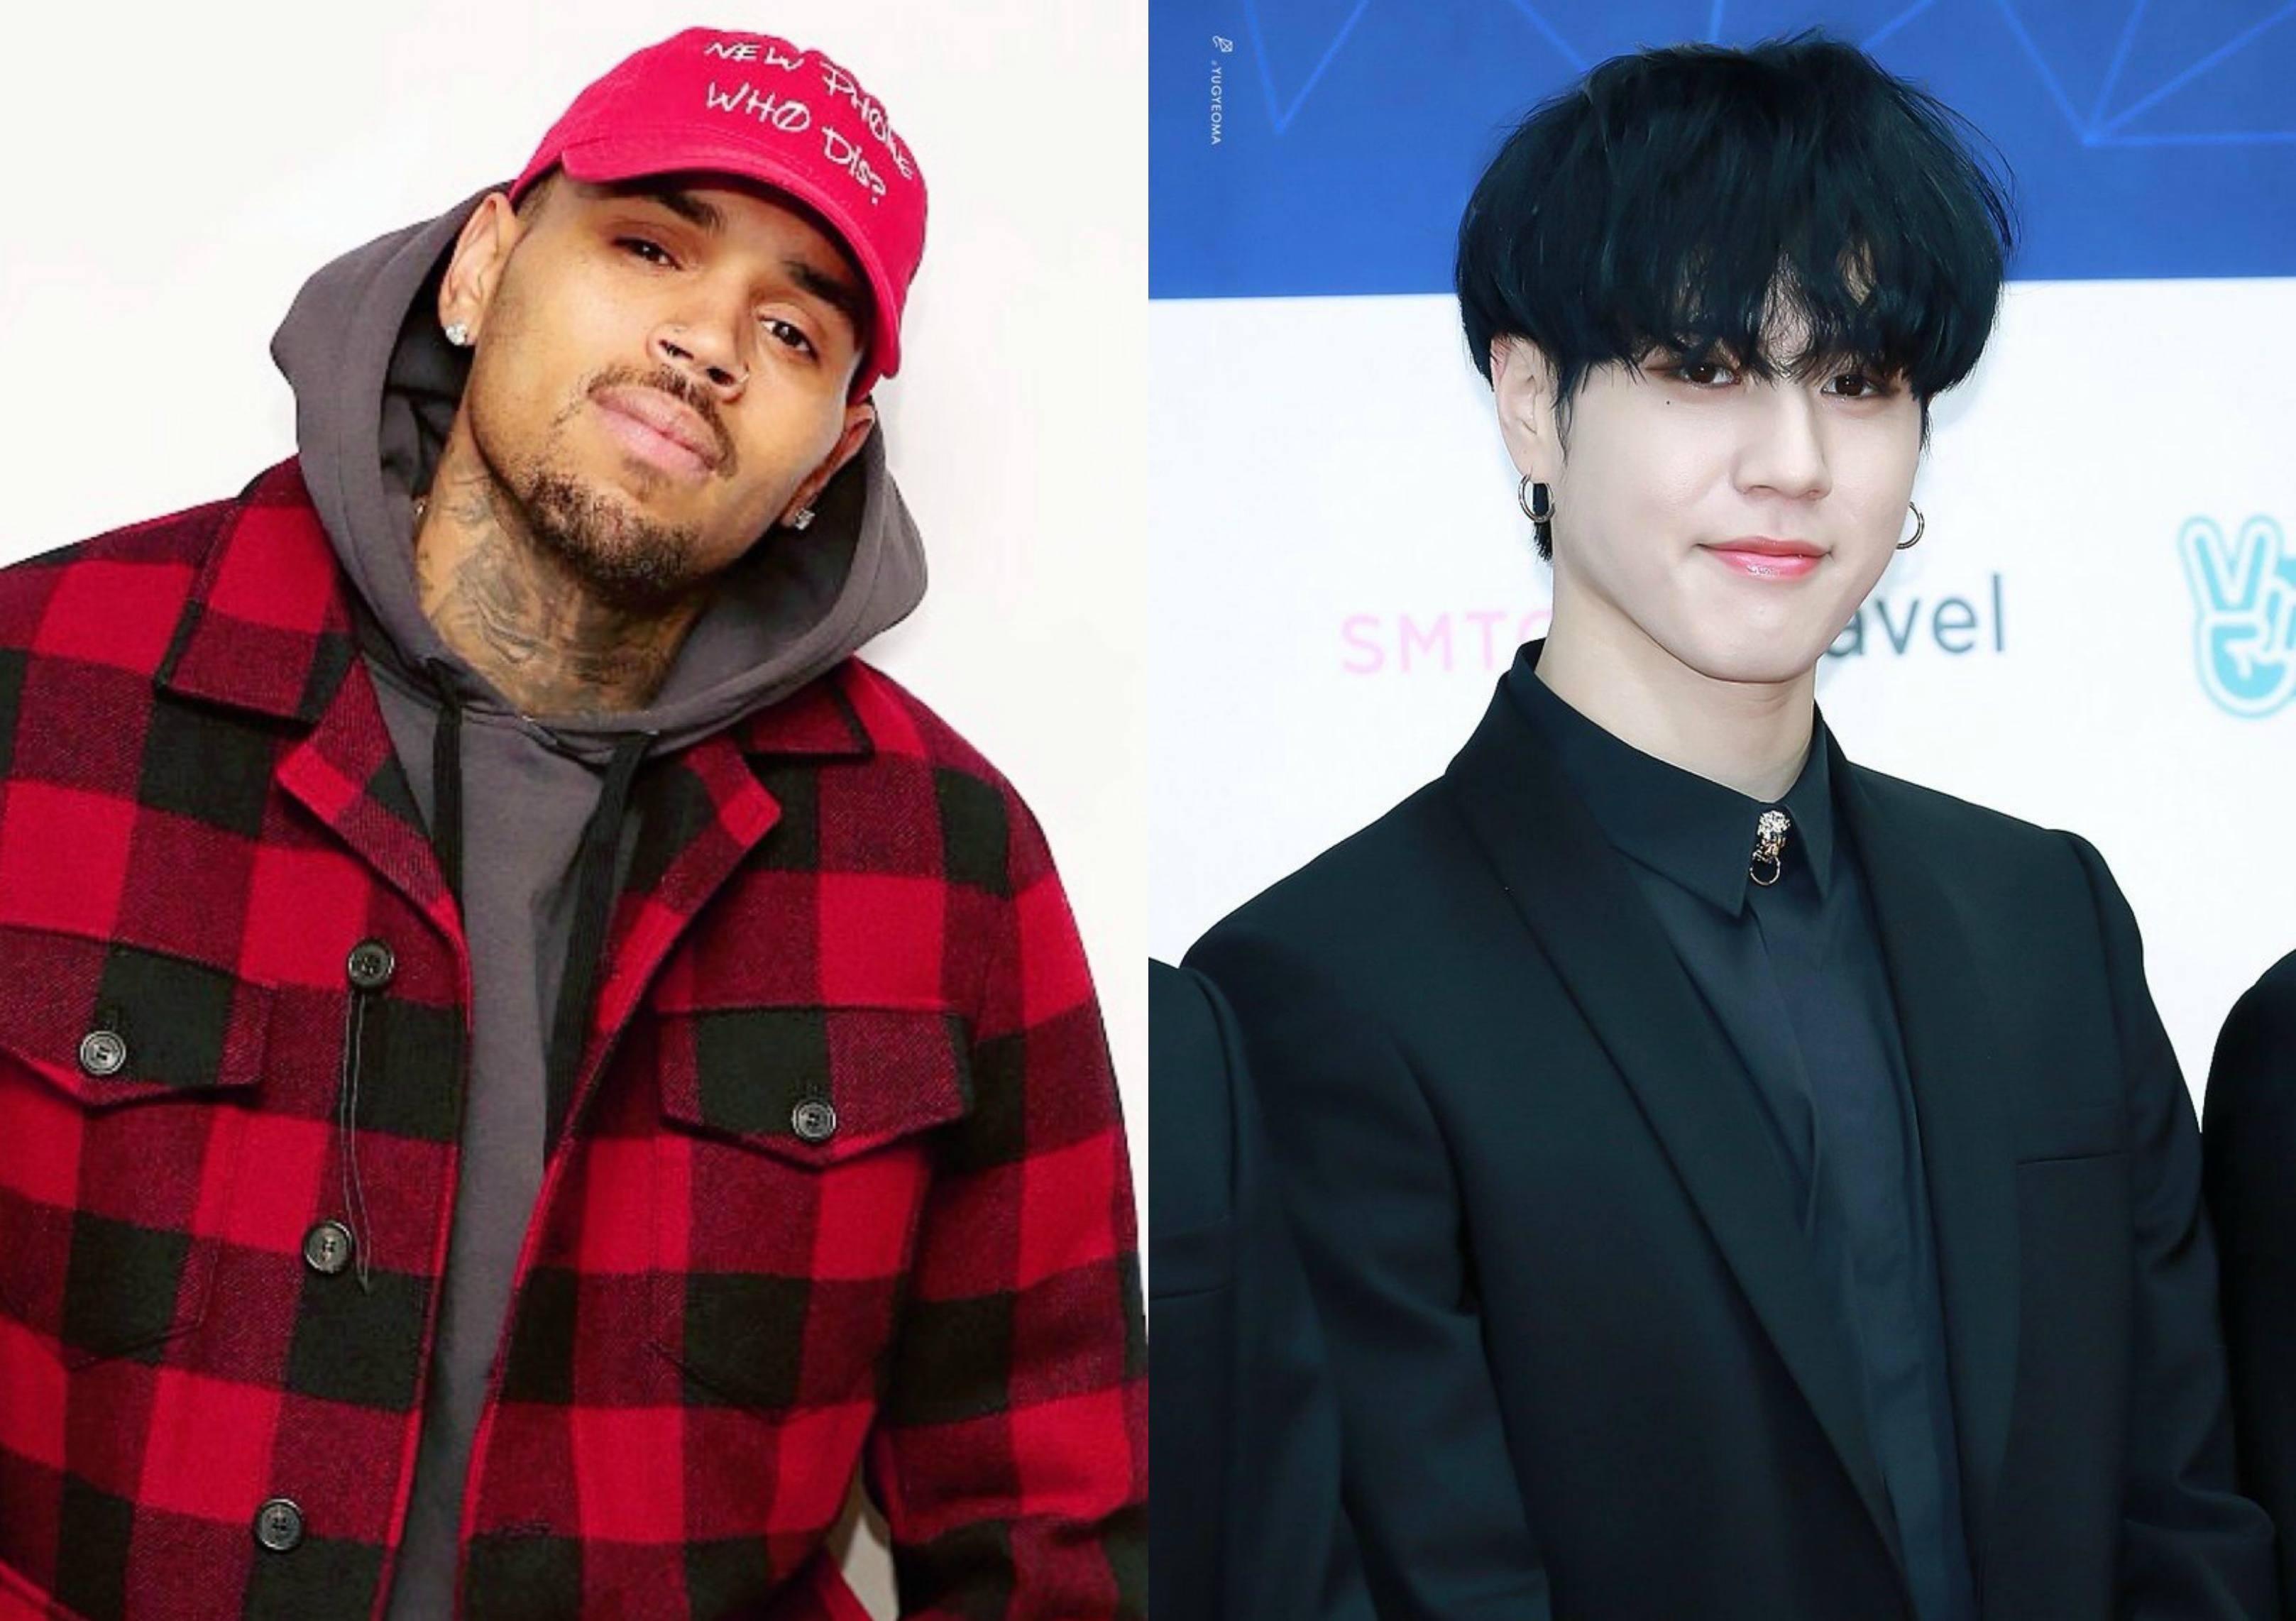 Chris Brown Follows GOT7's Yugyeom On Instagram — Koreaboo